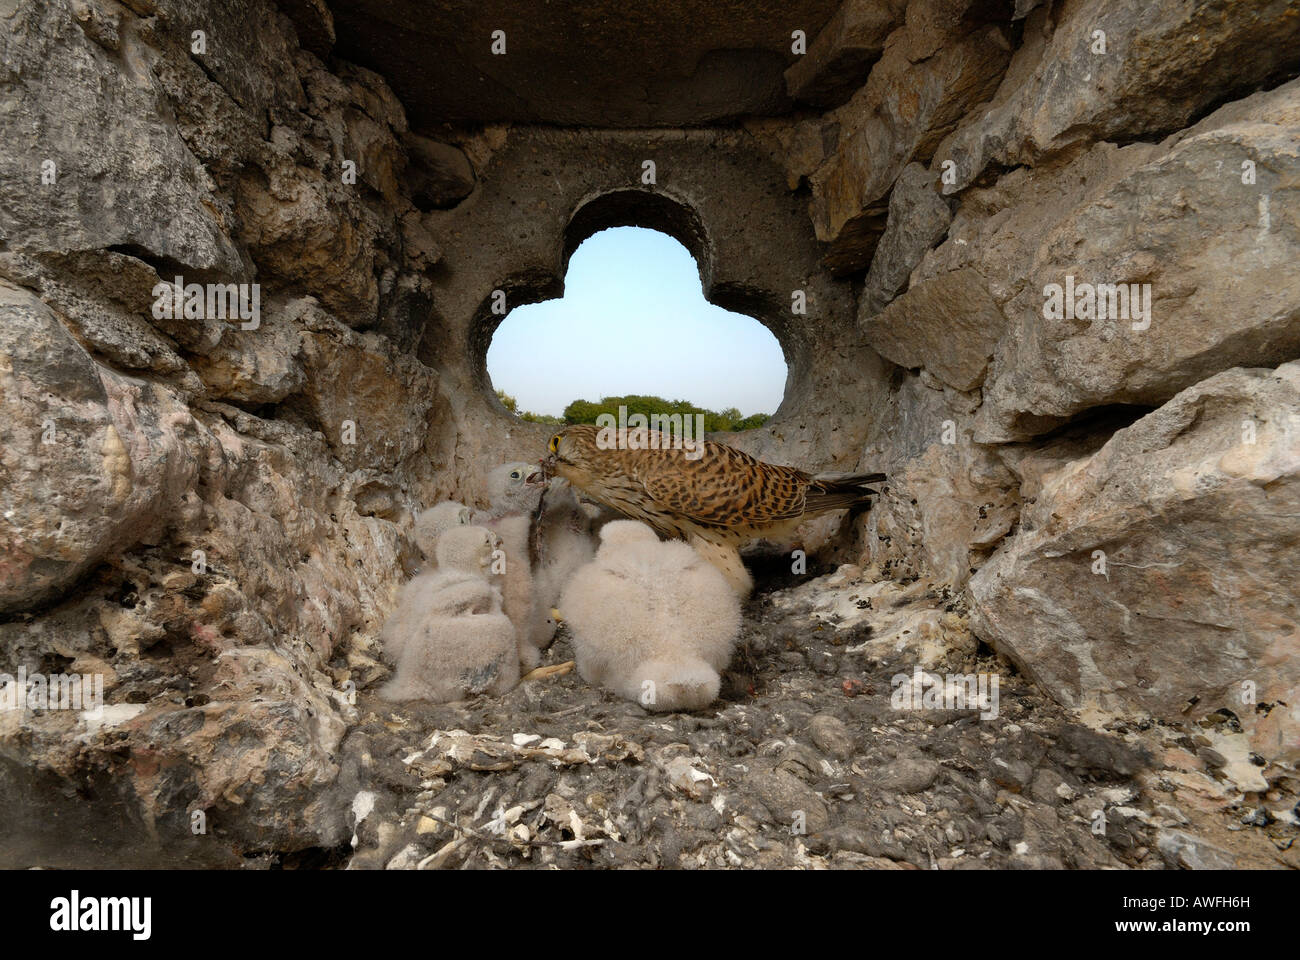 Gemeinsam- oder europäische Turmfalke (Falco Tinnunculus) jungen in ihrem Nest füttert Stockbild